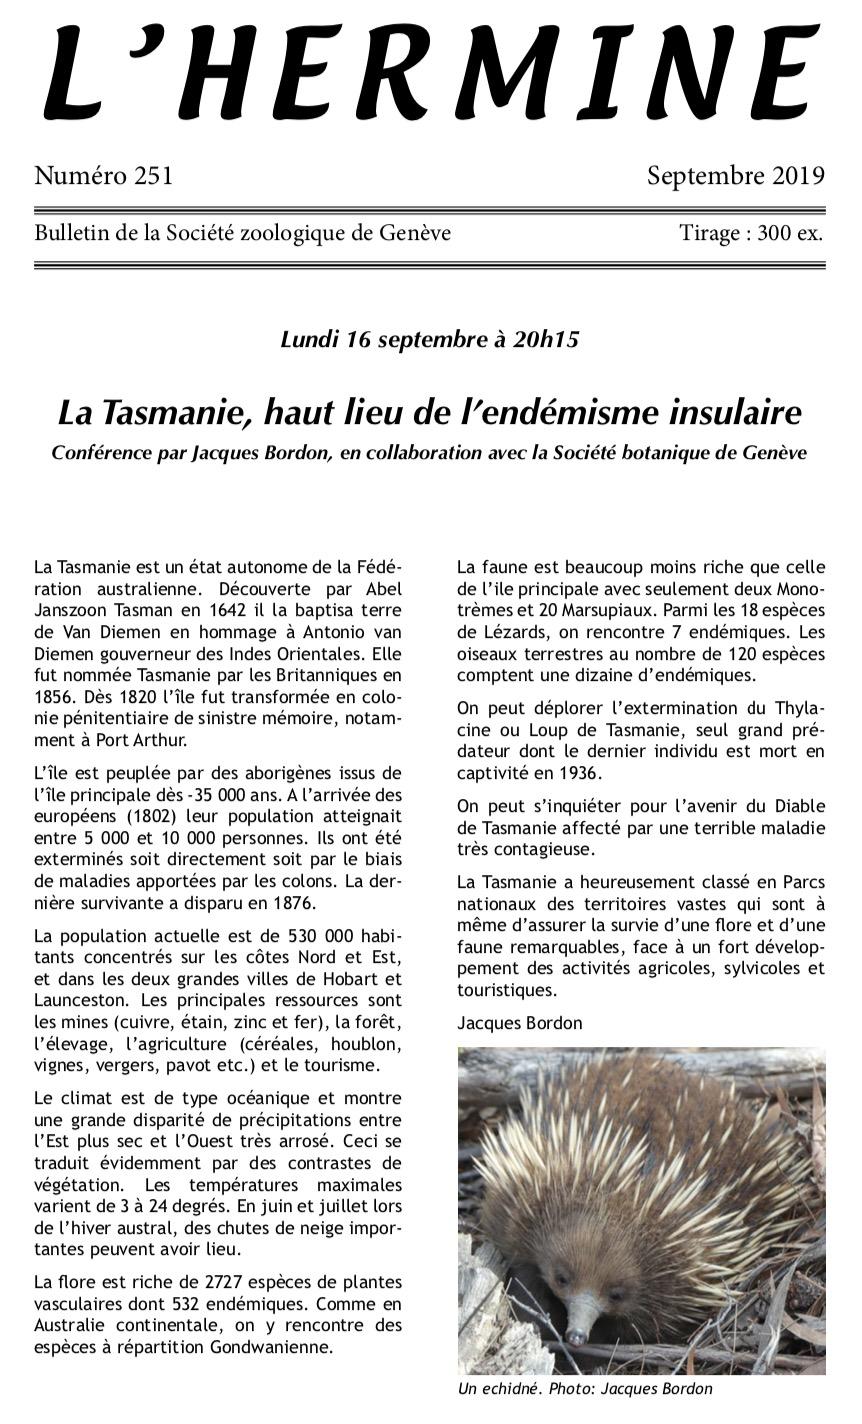 http://files.biolovision.net/www.faunegeneve.ch/userfiles/Admin/zool.jpg